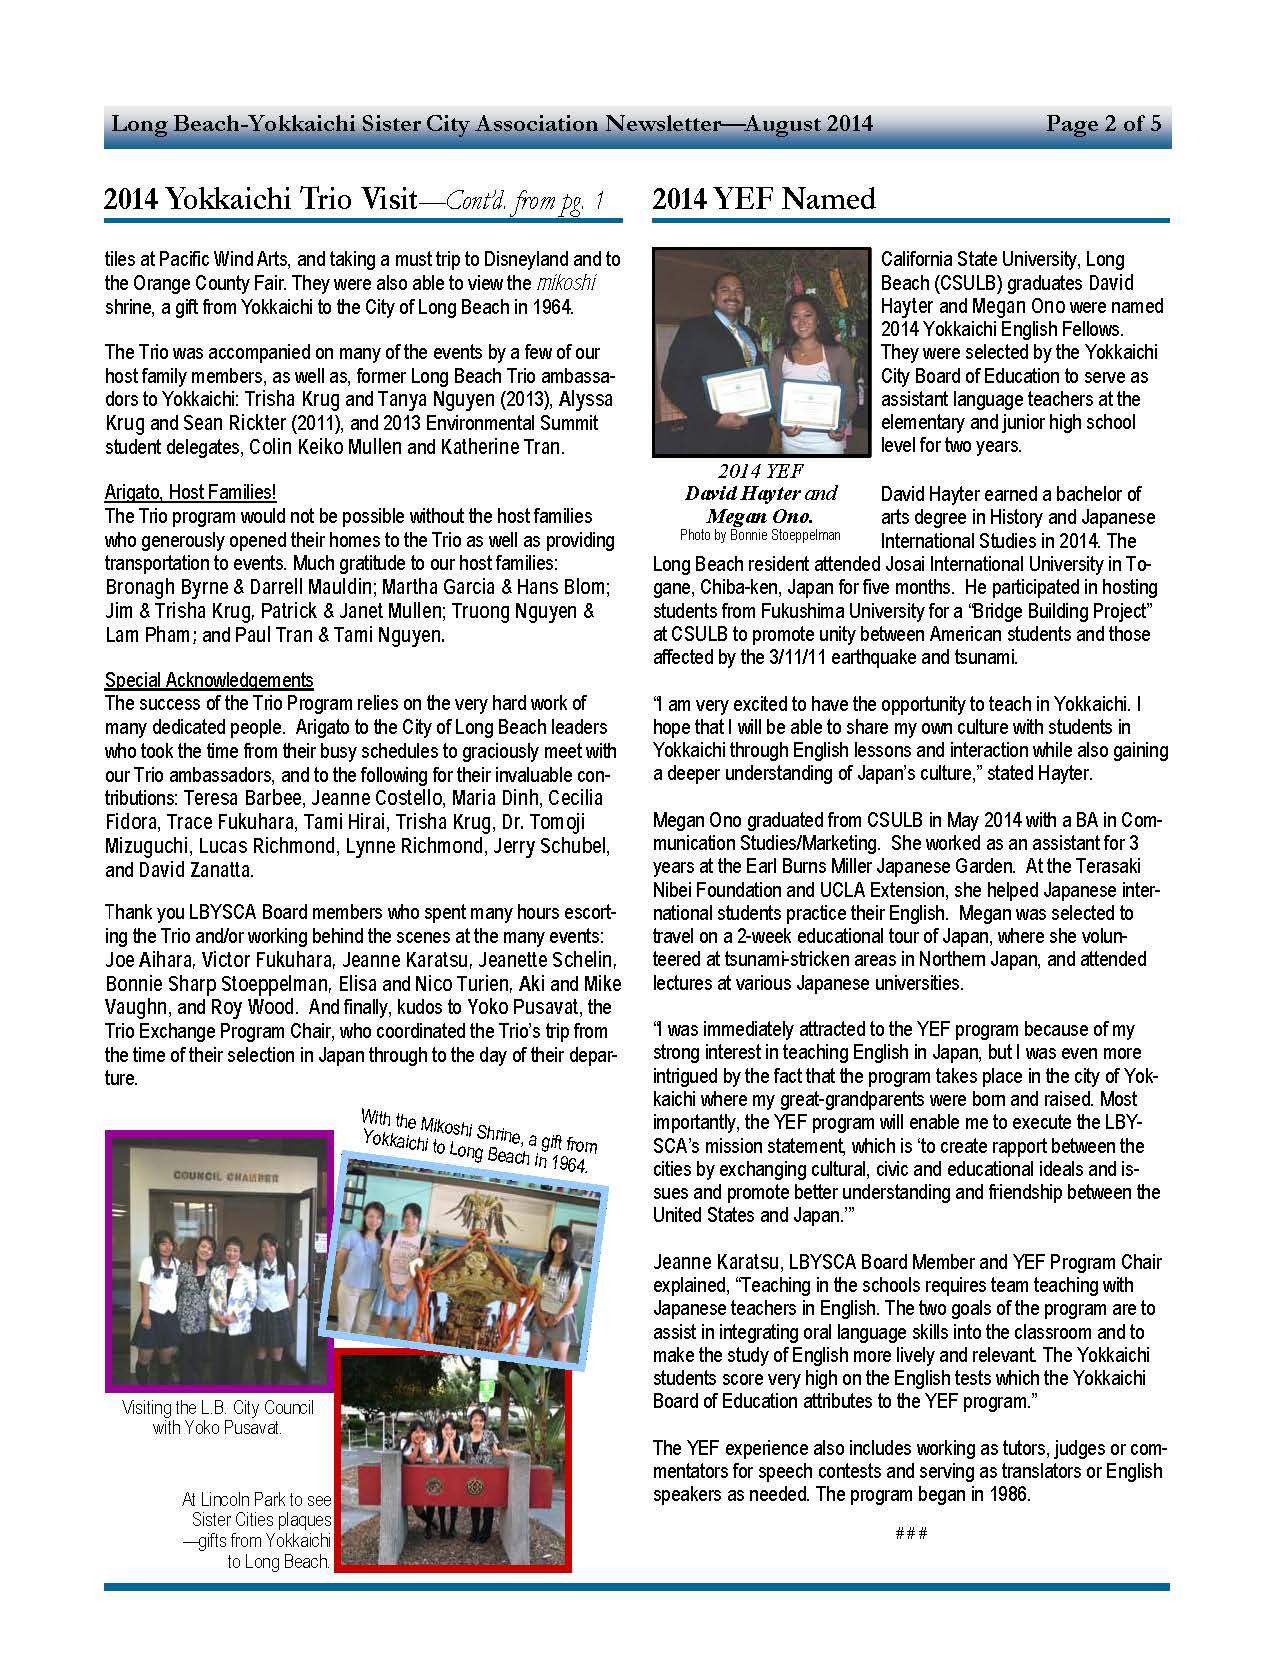 Yokkaichi Sister City Newsletter Aug 2014